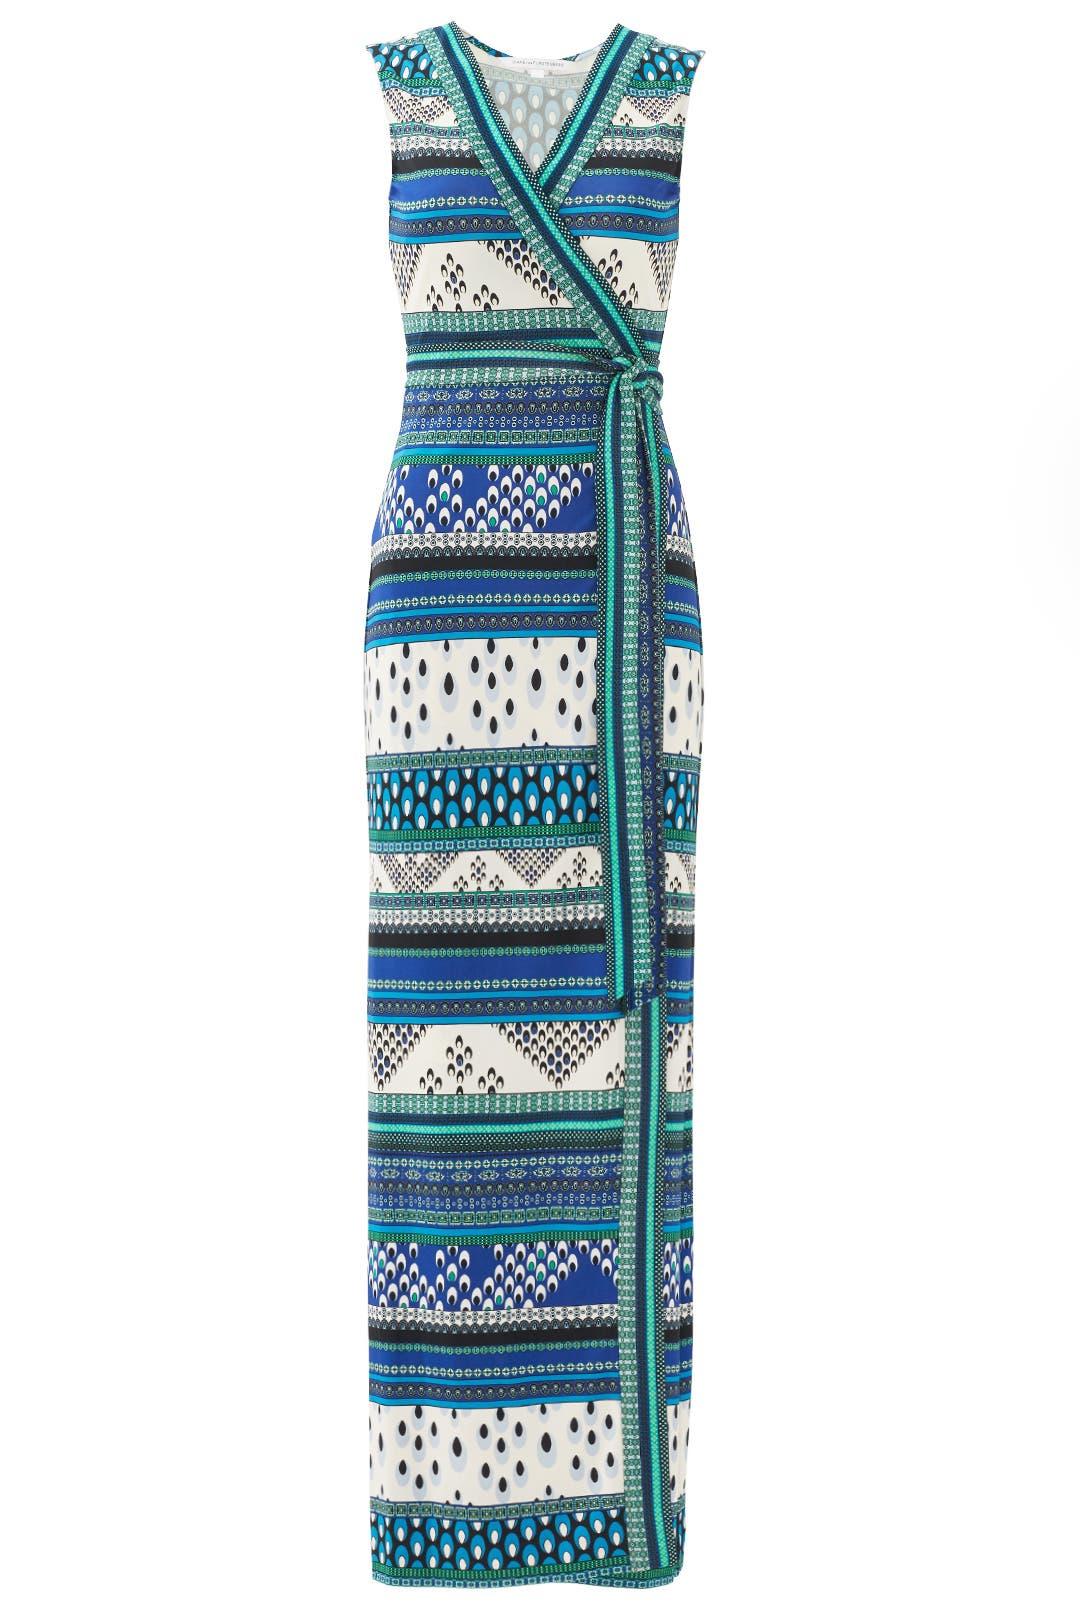 New Yahzi Maxi Wrap Dress by Diane von Furstenberg for $55 - $75 ...